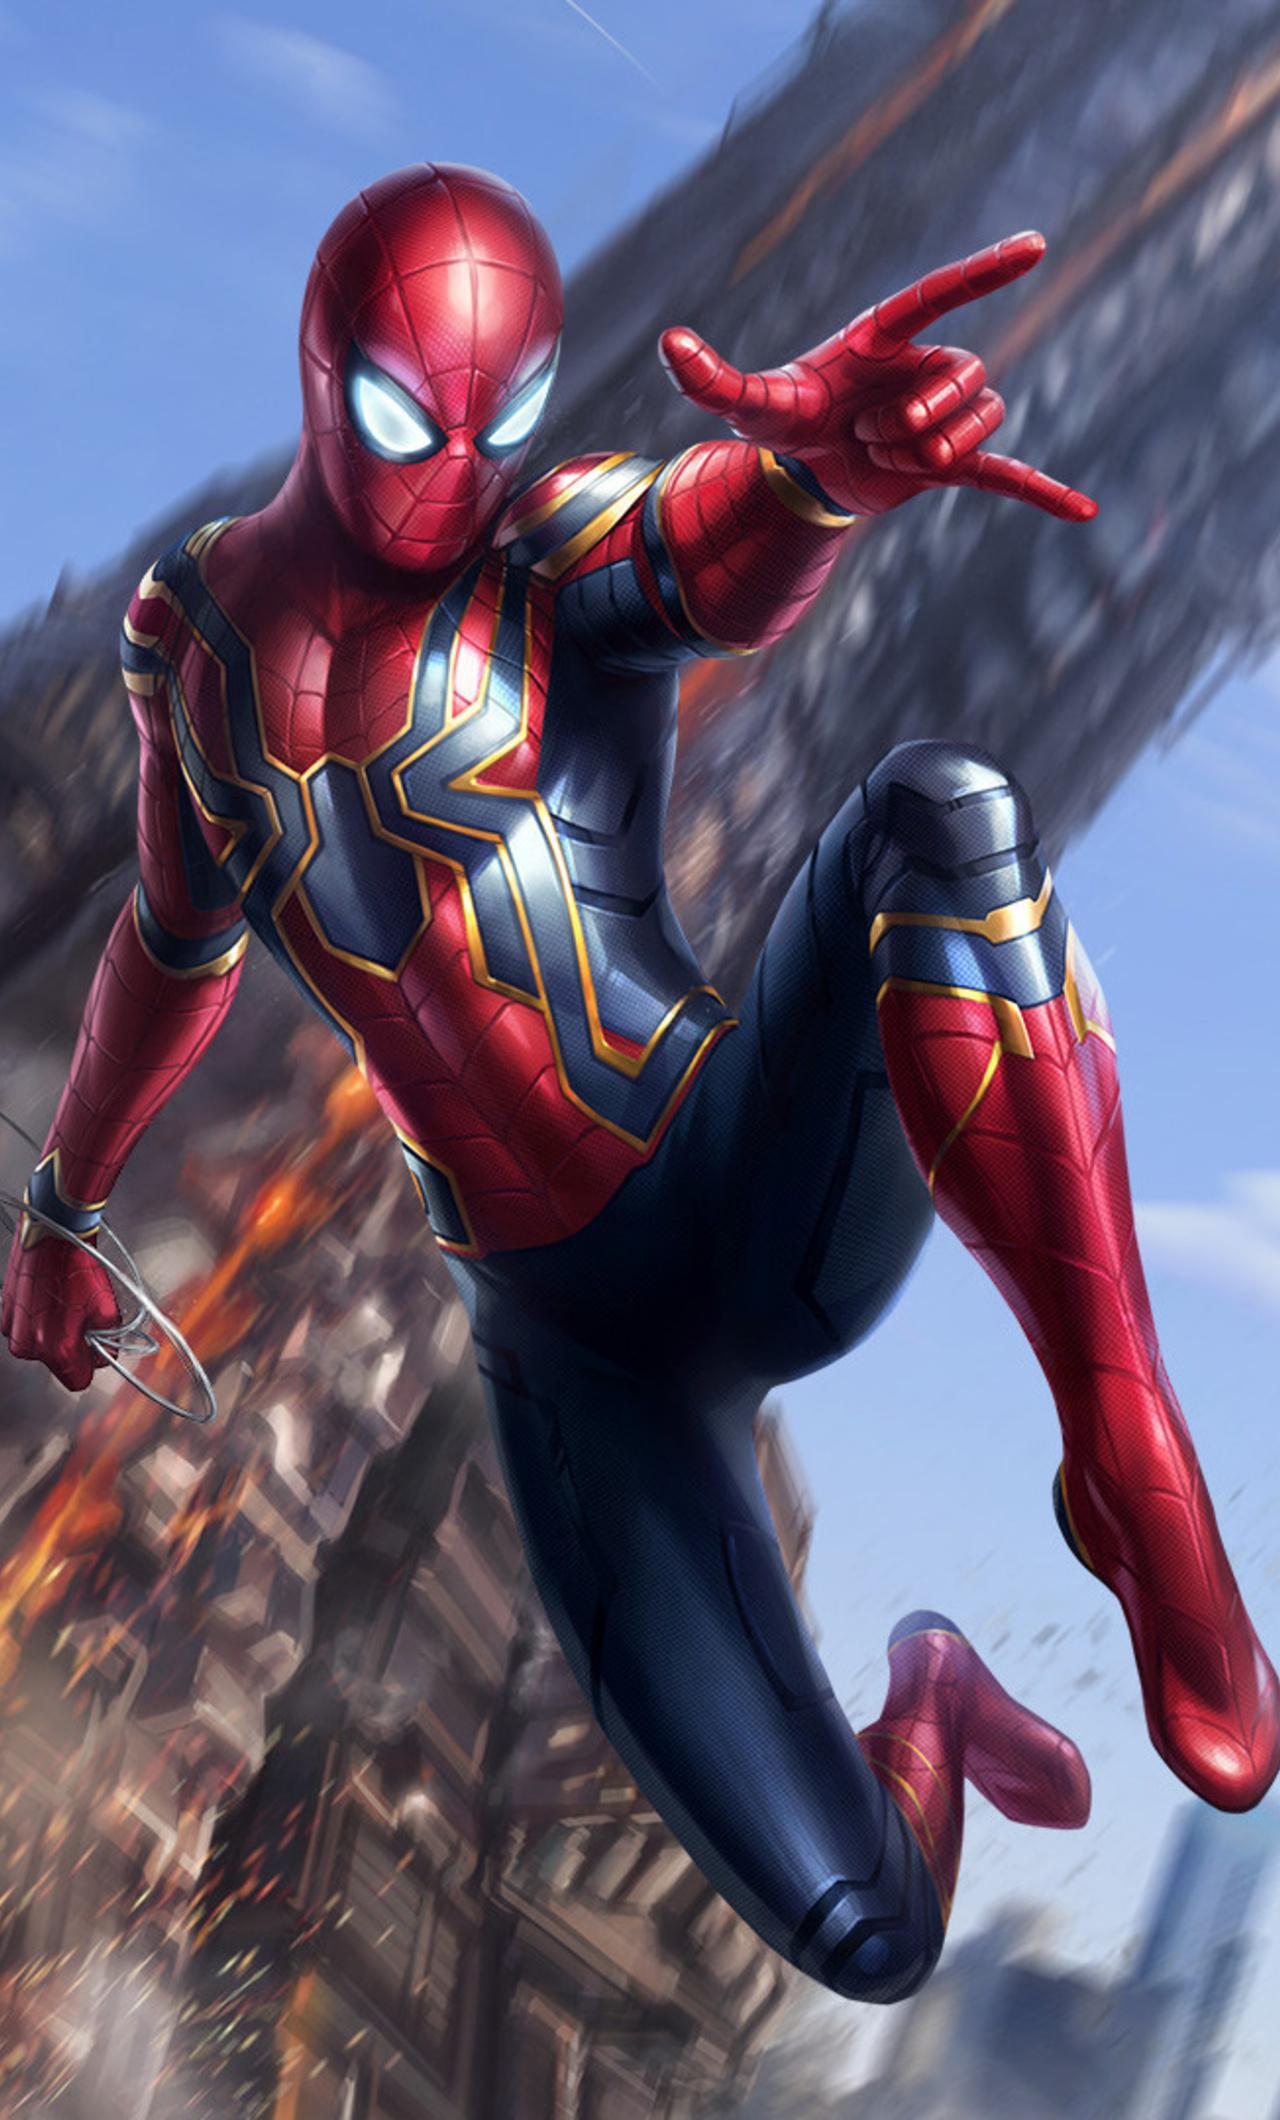 1280x2120 spiderman avengers infinity war art iphone 6 hd - Spider man infinity war wallpaper ...